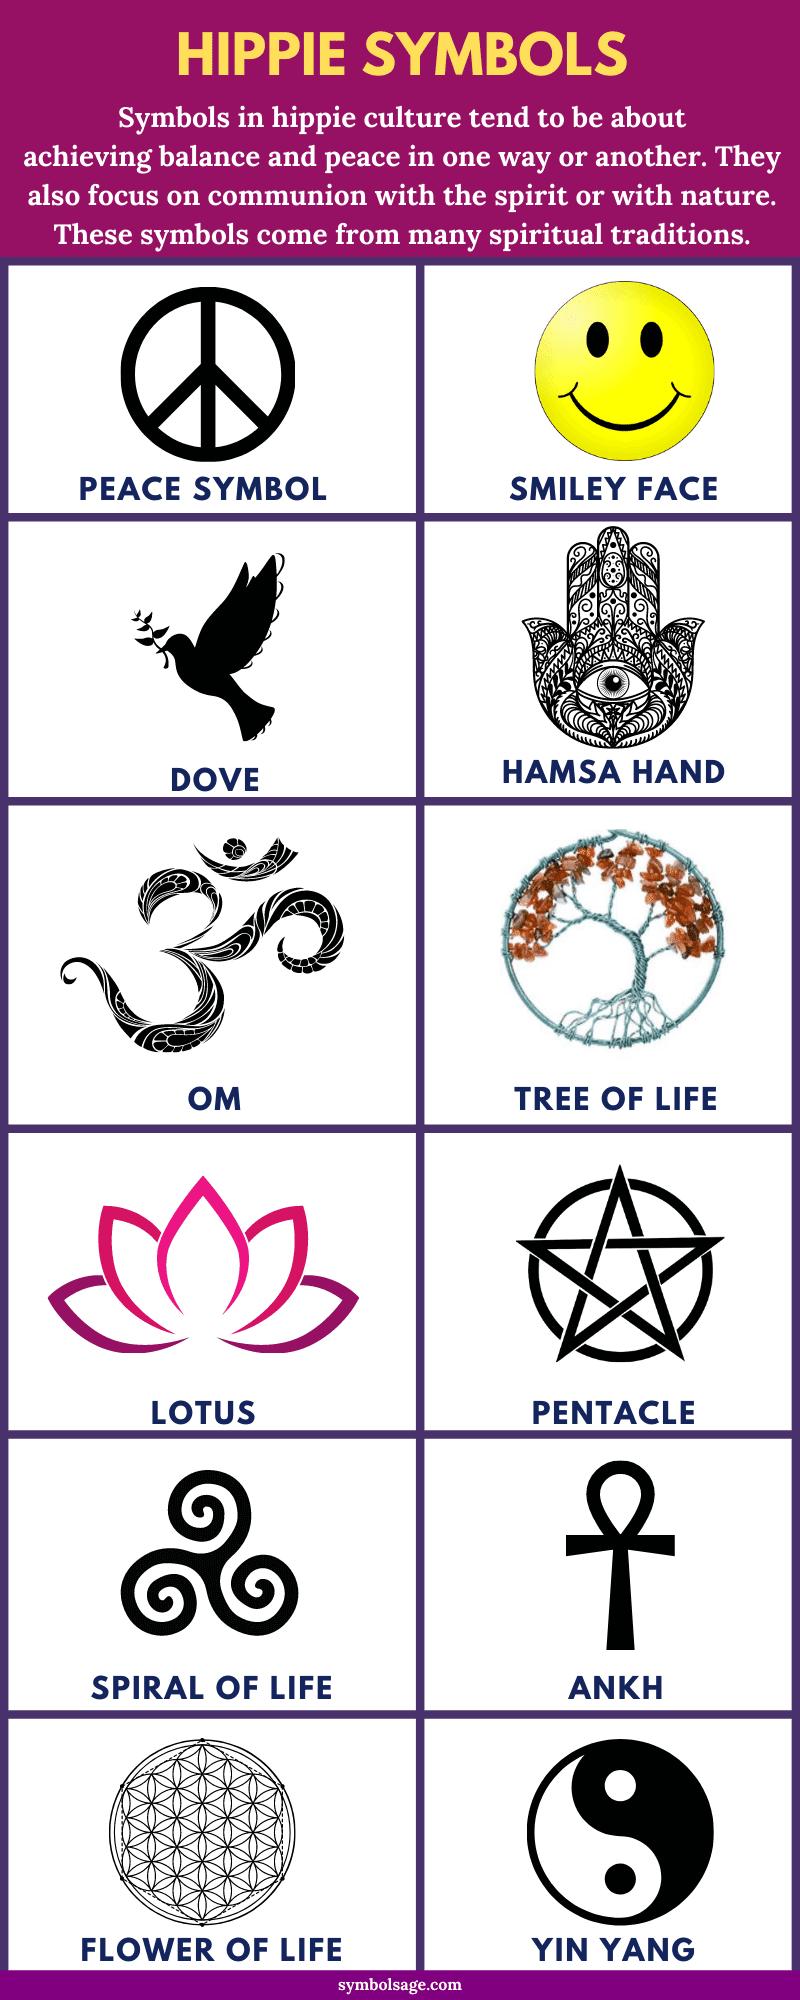 List of hippie symbols